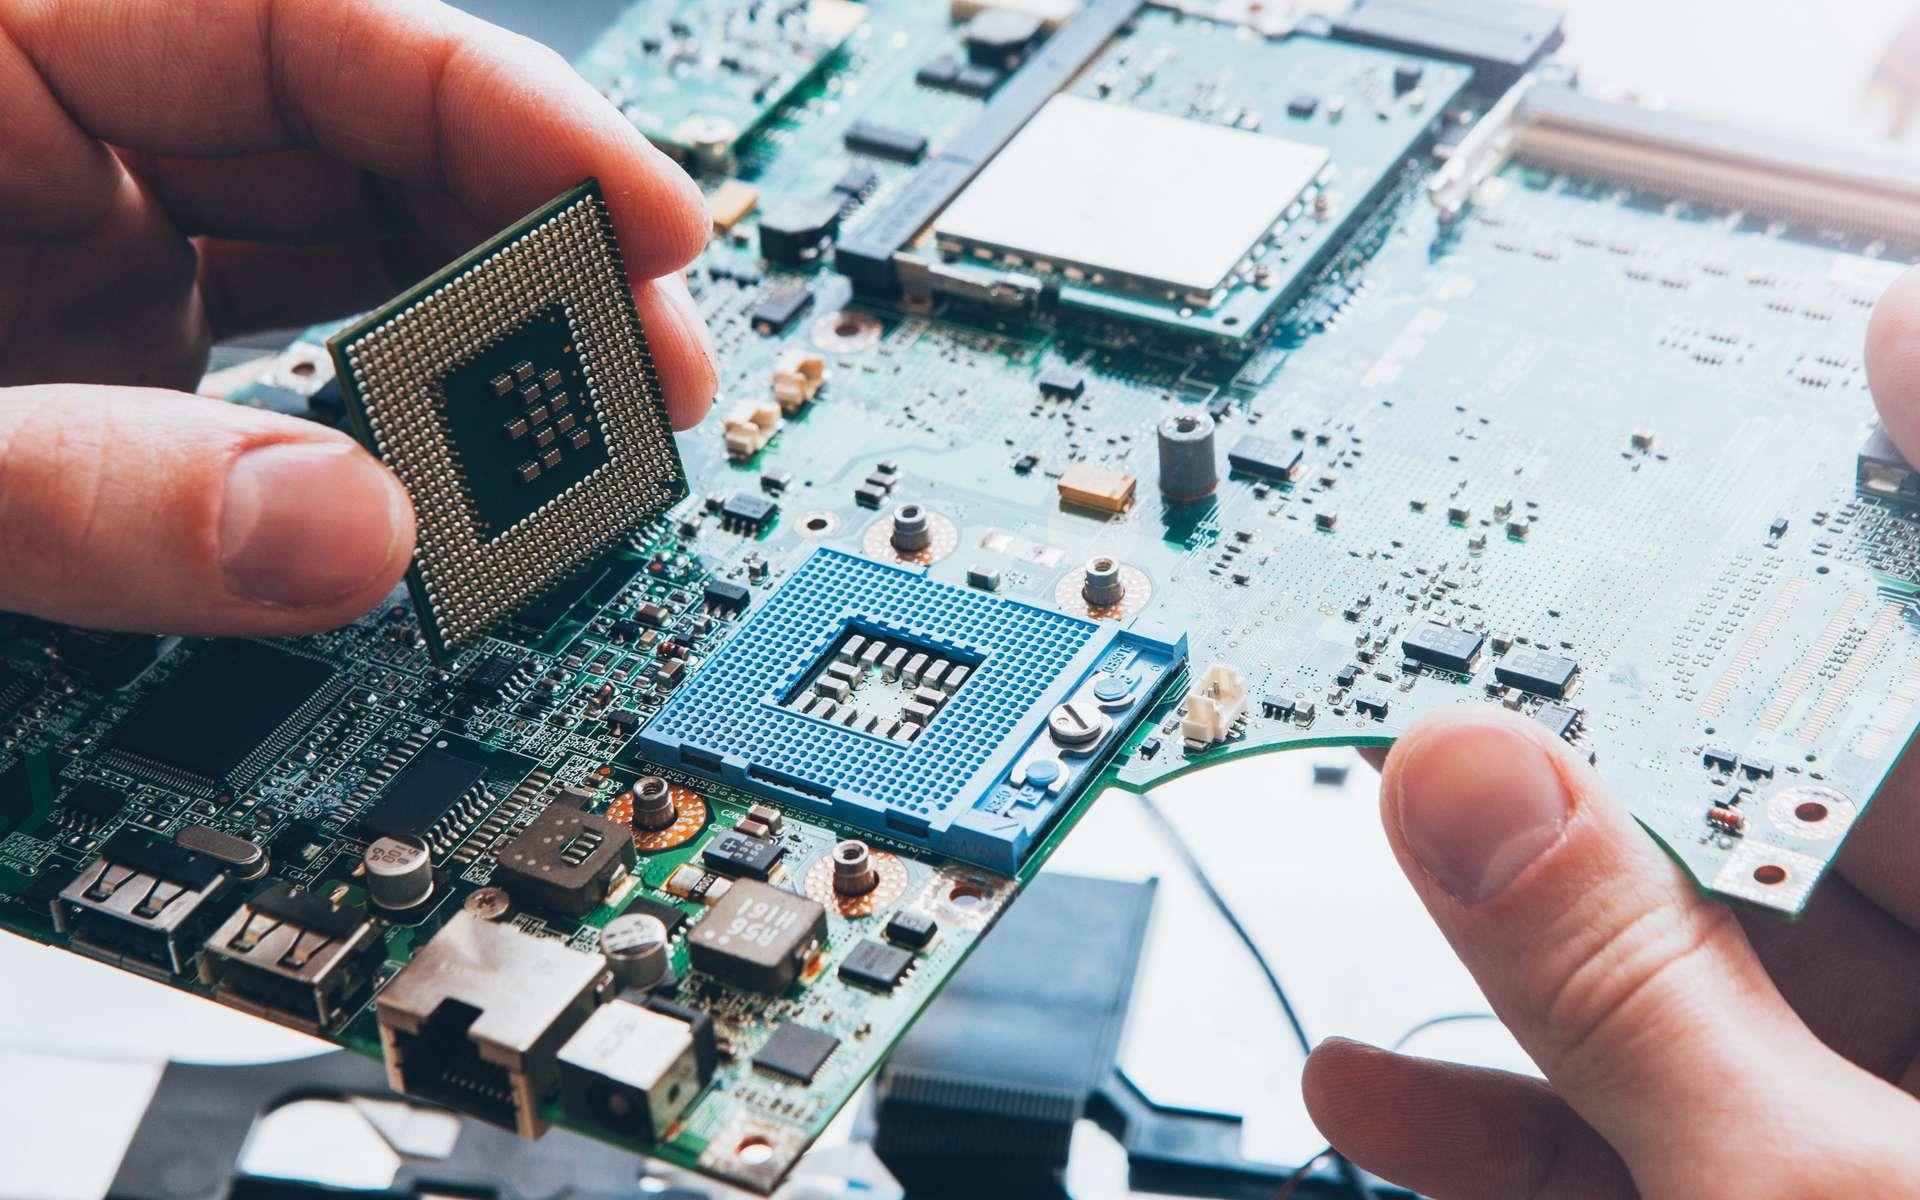 a1a37d83b3_50159359_processeur